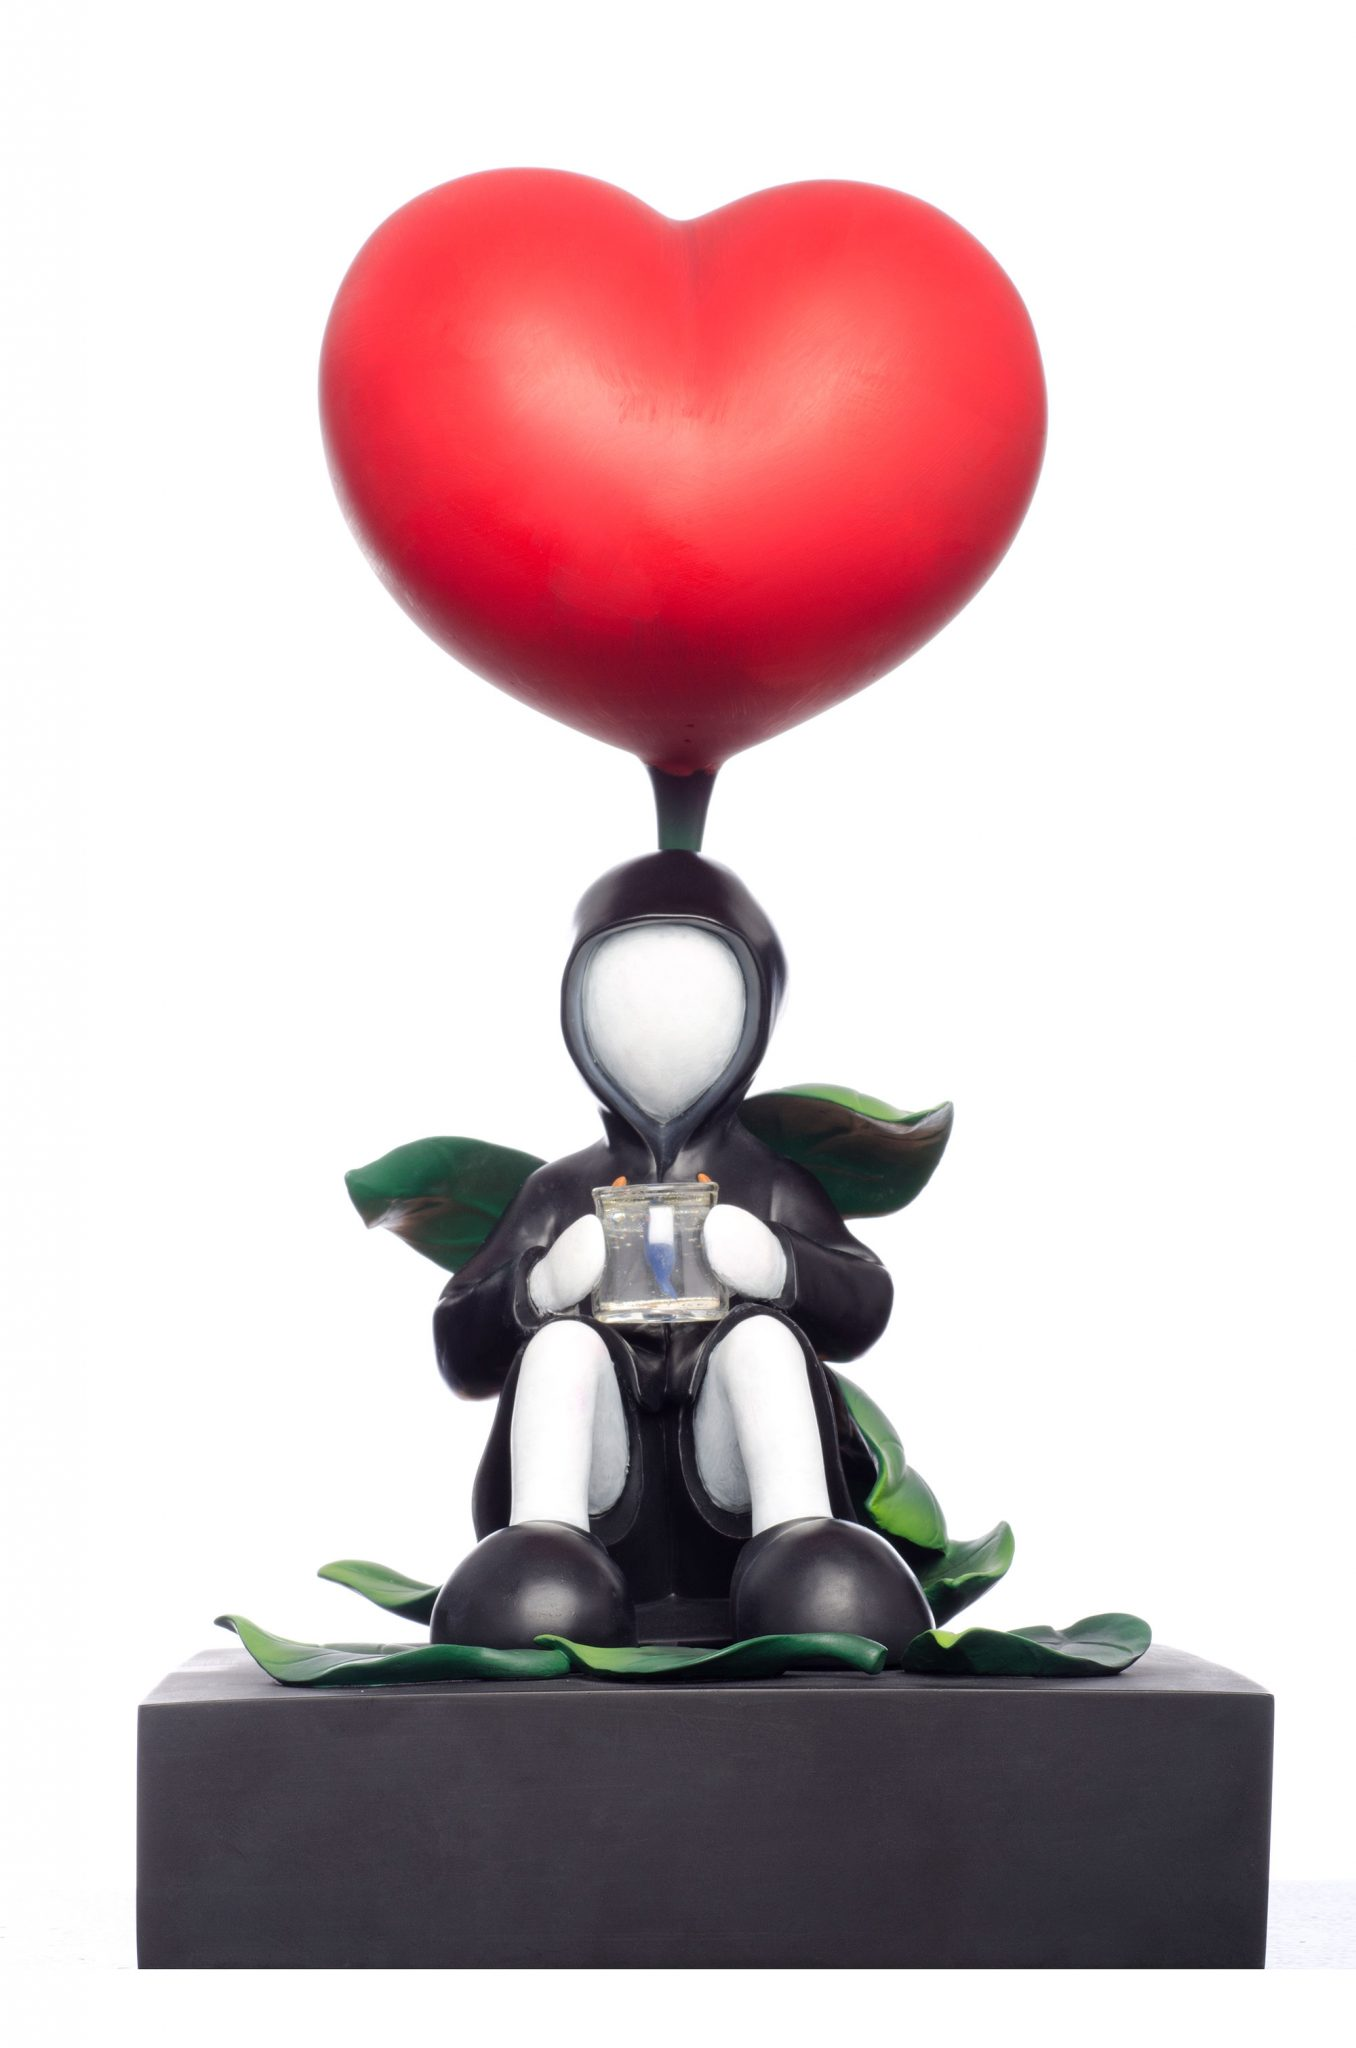 Waiting with Love big heart sculpture by Mackenzie Thorpe